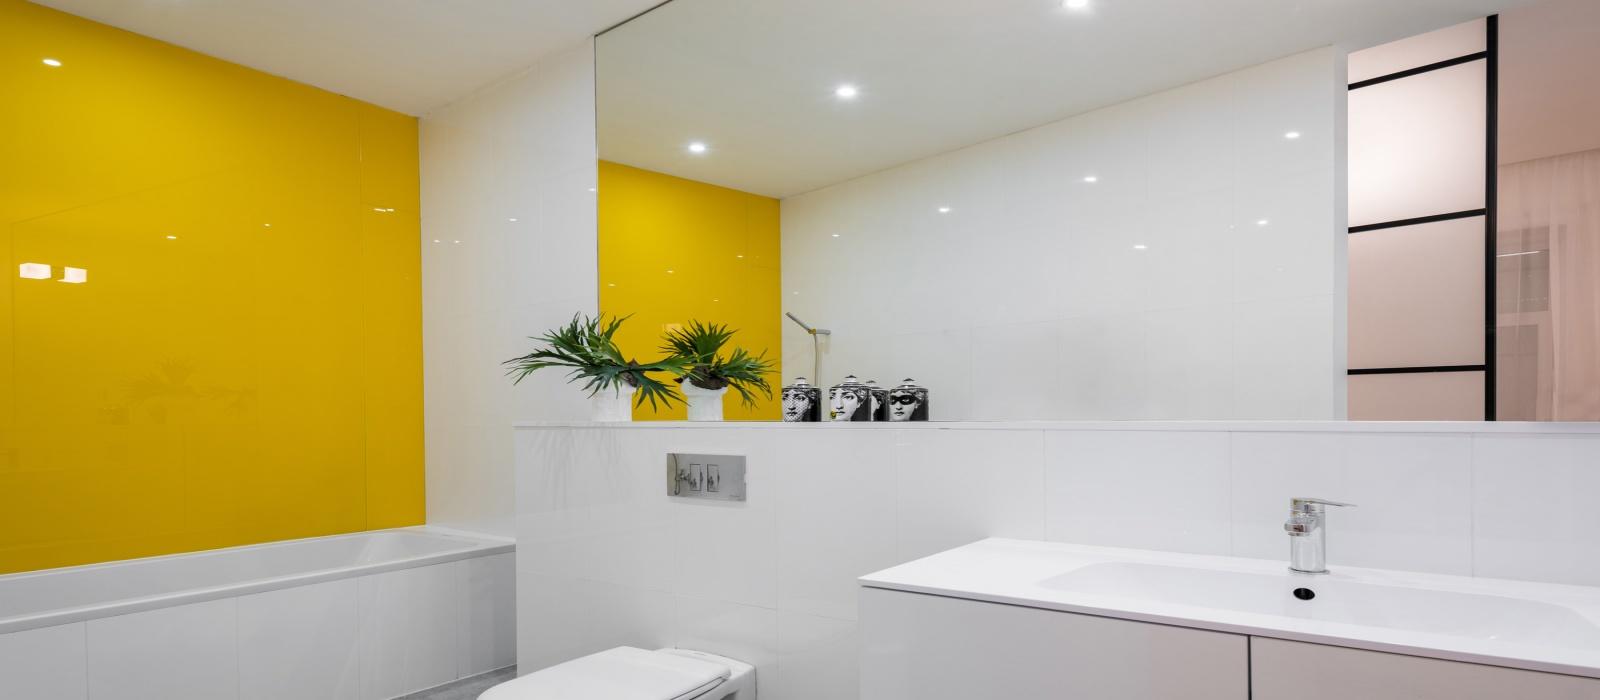 Hungary,3 Bedrooms Bedrooms,3 BathroomsBathrooms,Apartment,2,1303